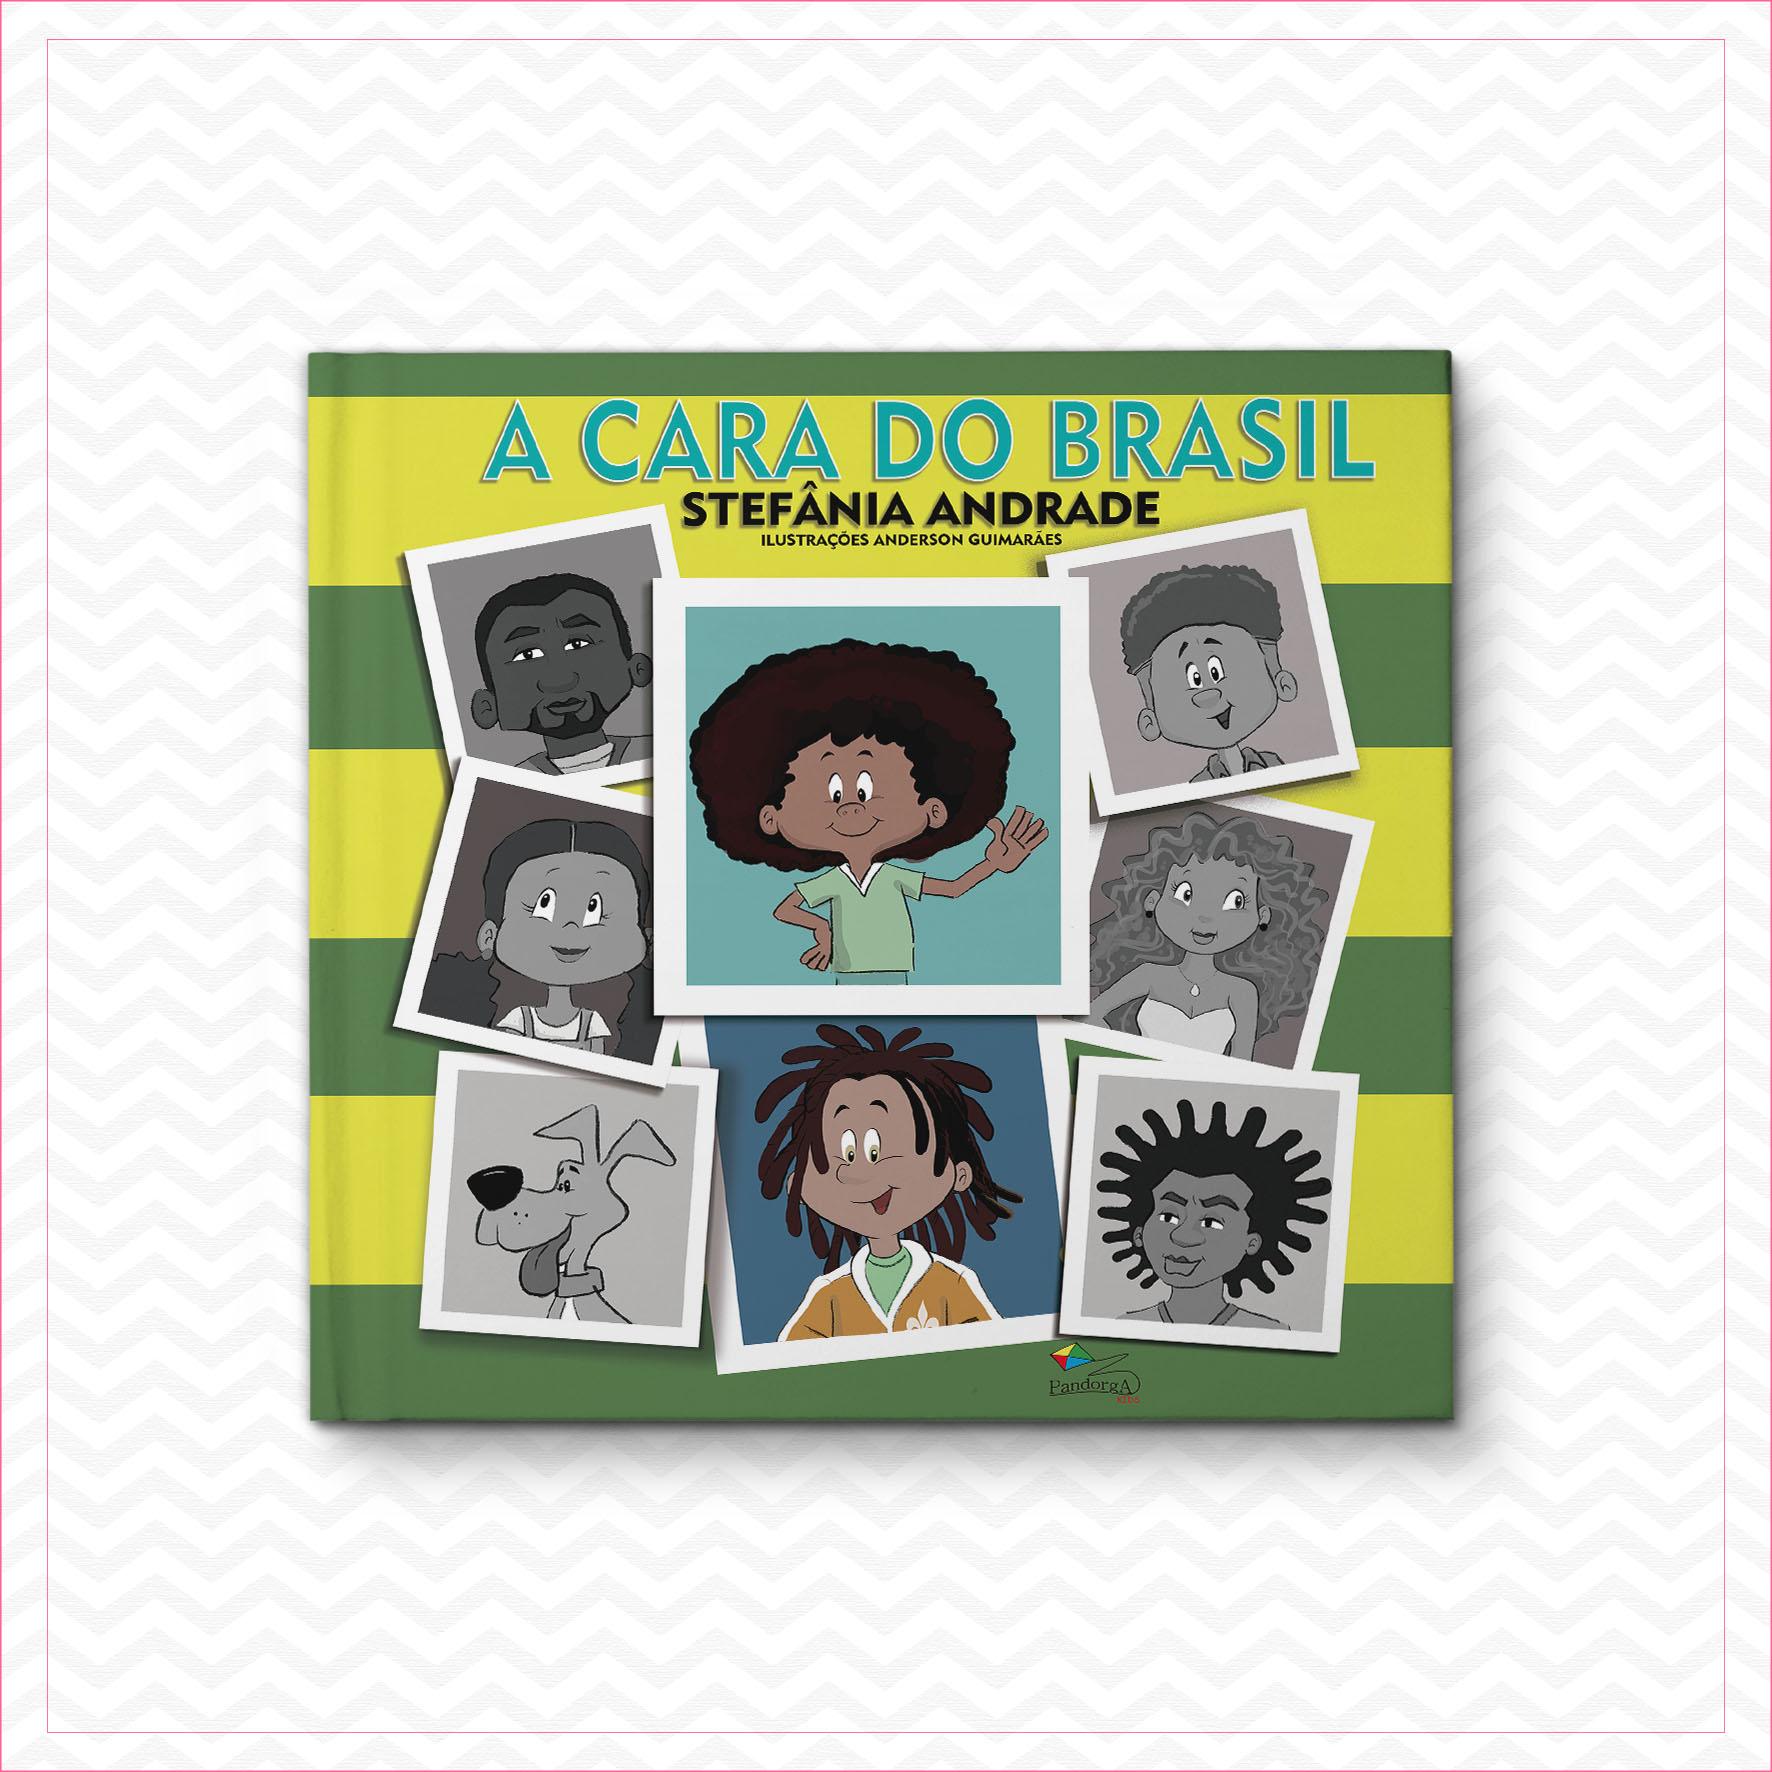 A cara do Brasil – Stefânia Andrade